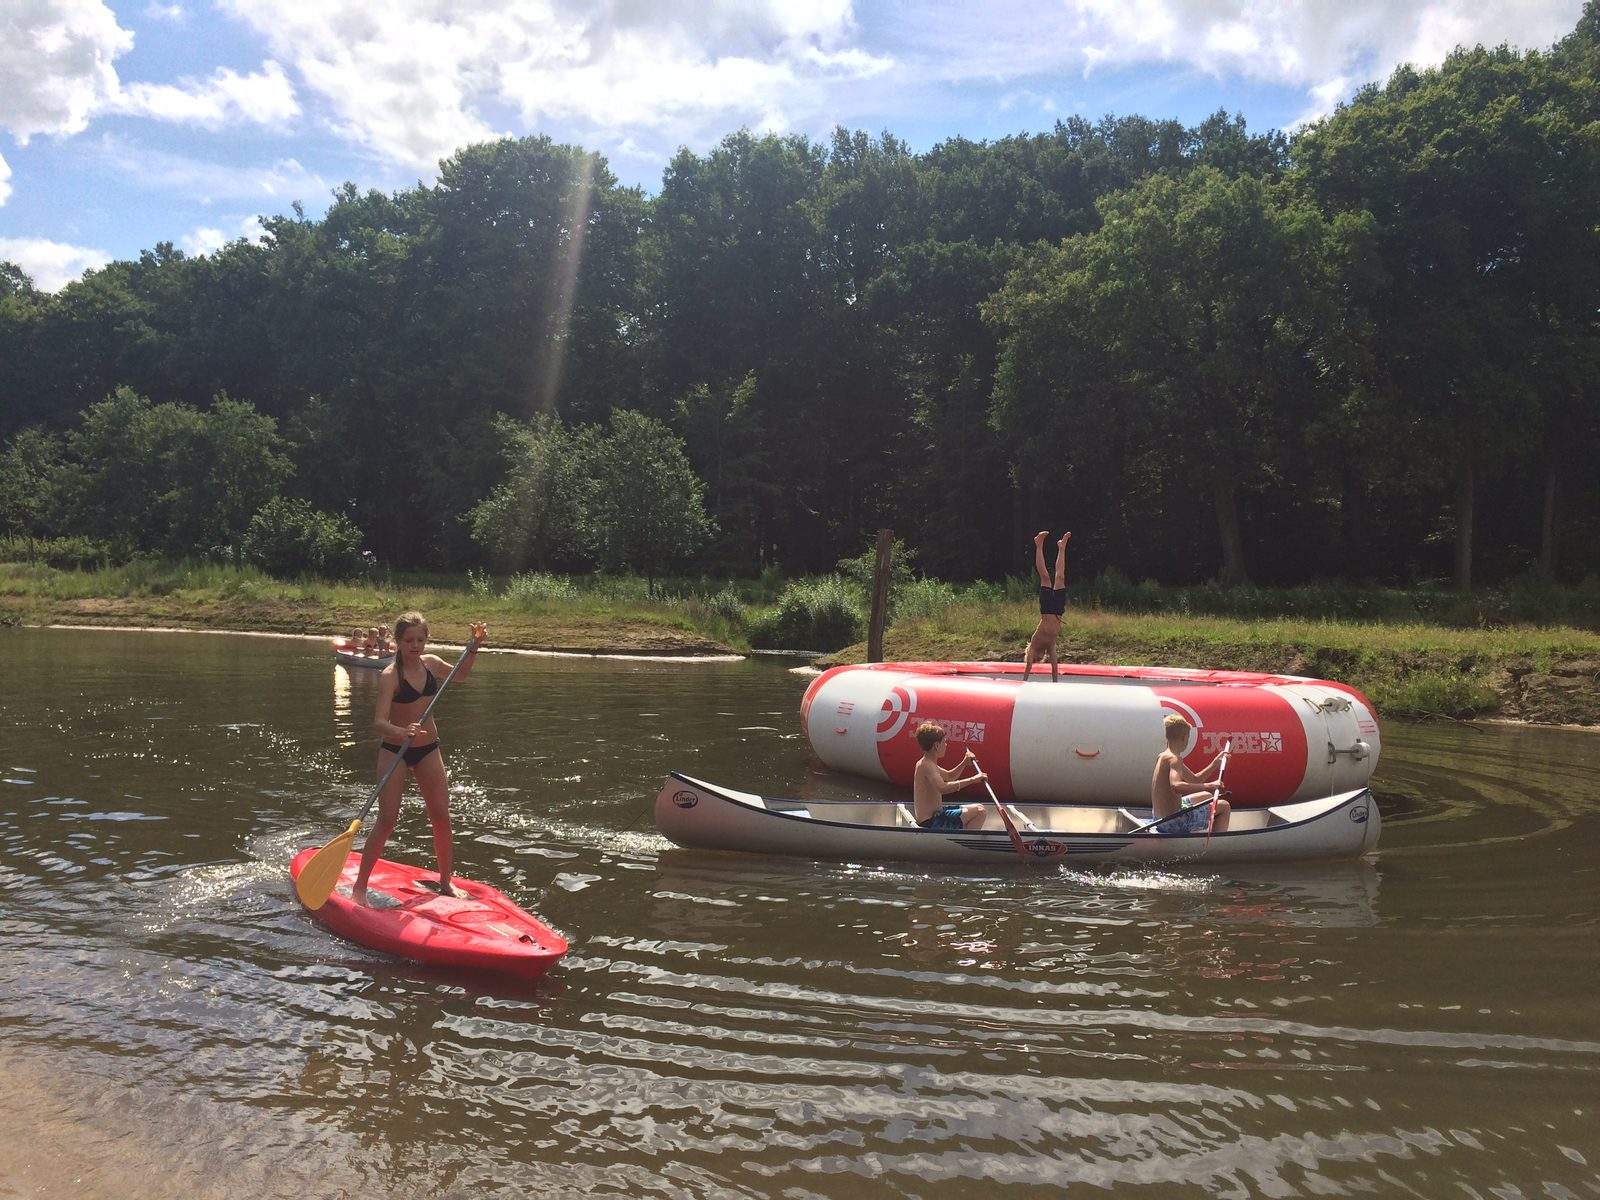 Camping de Koeksebelt Overijssel sports and games